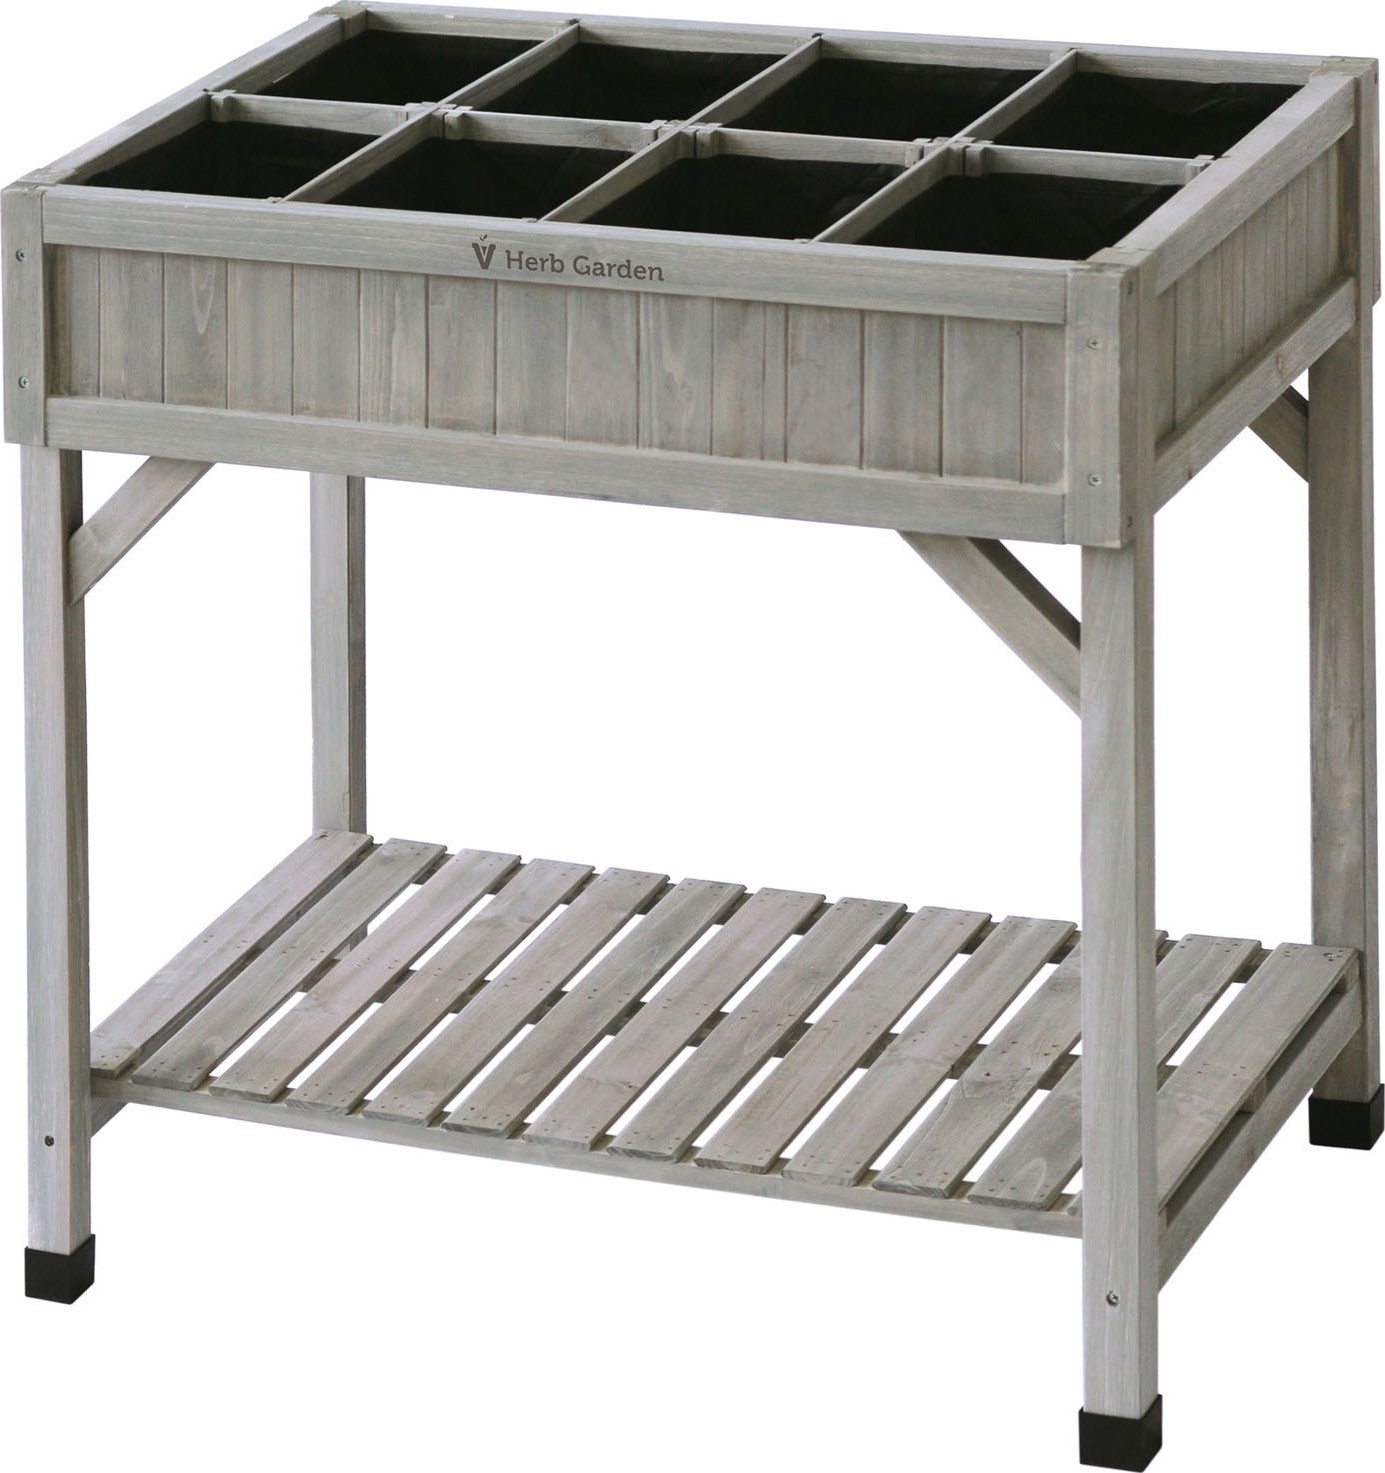 Plantentafelkruidentafel grijs